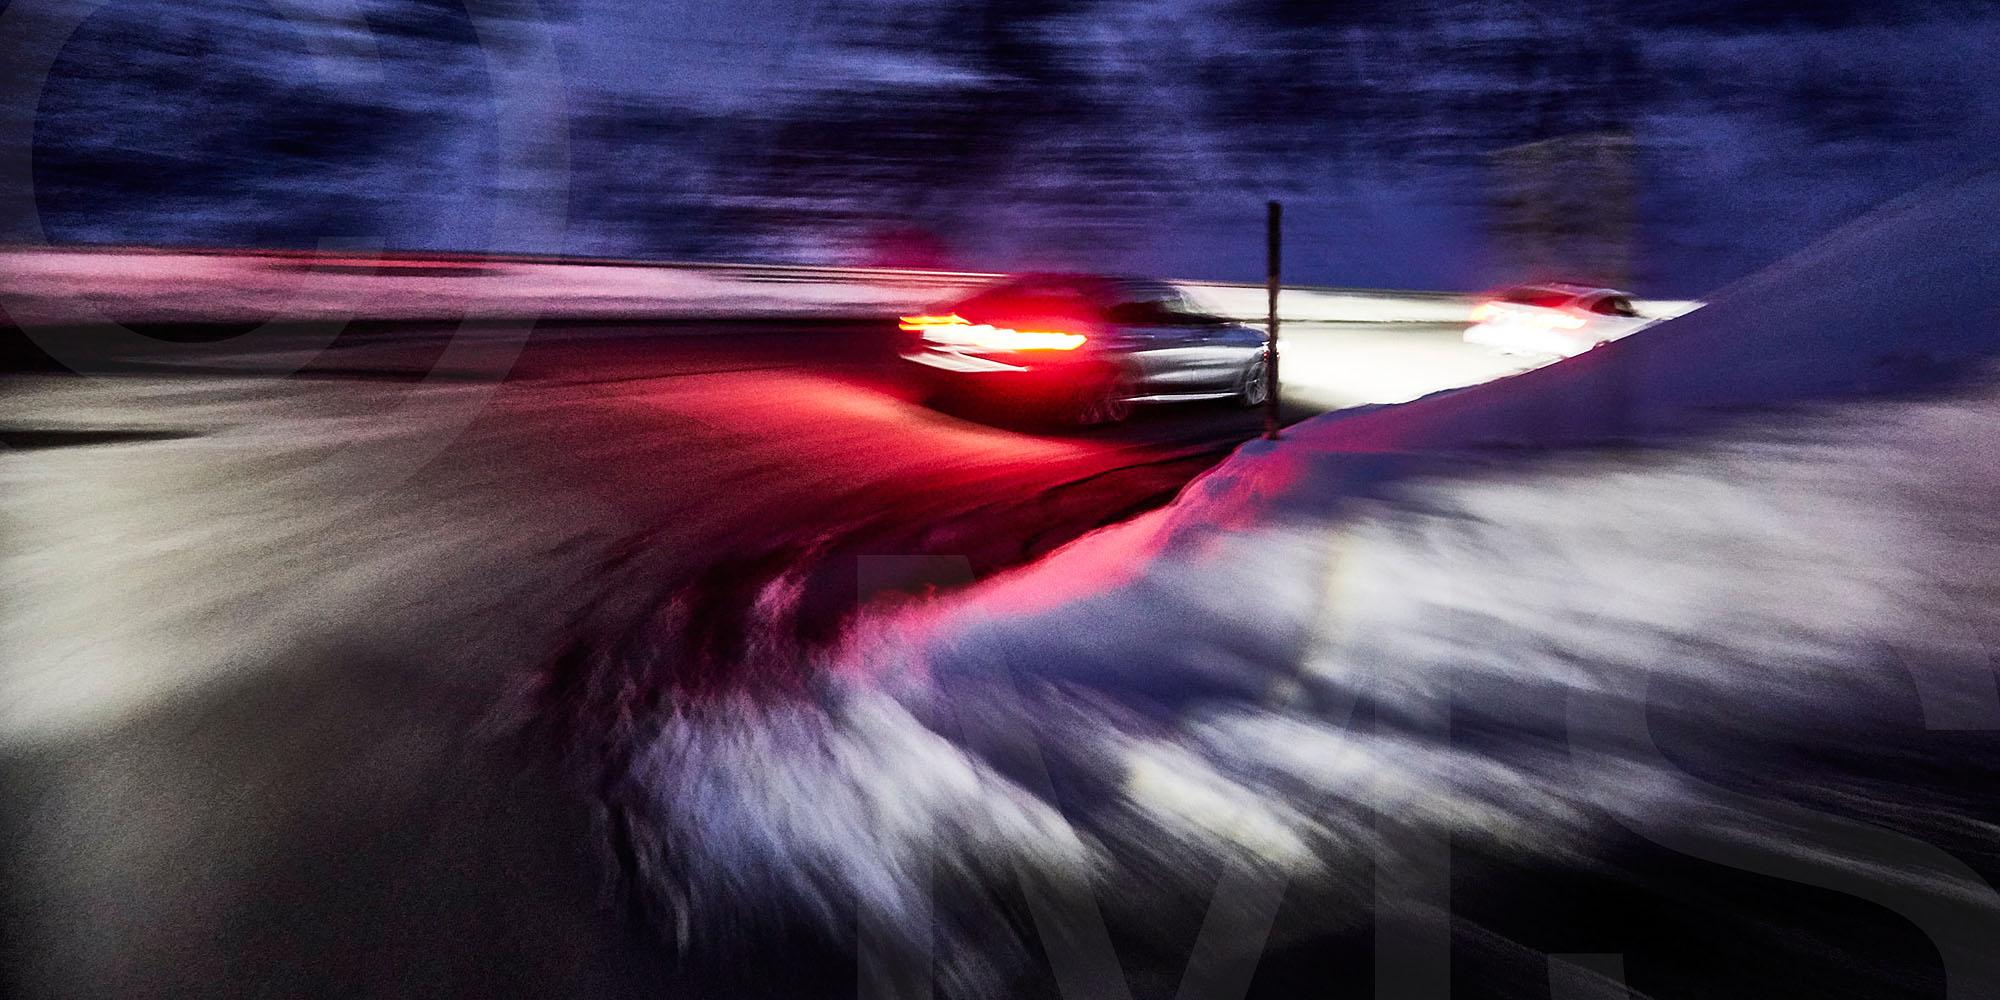 BMW_09_Abend-Kehre.jpg